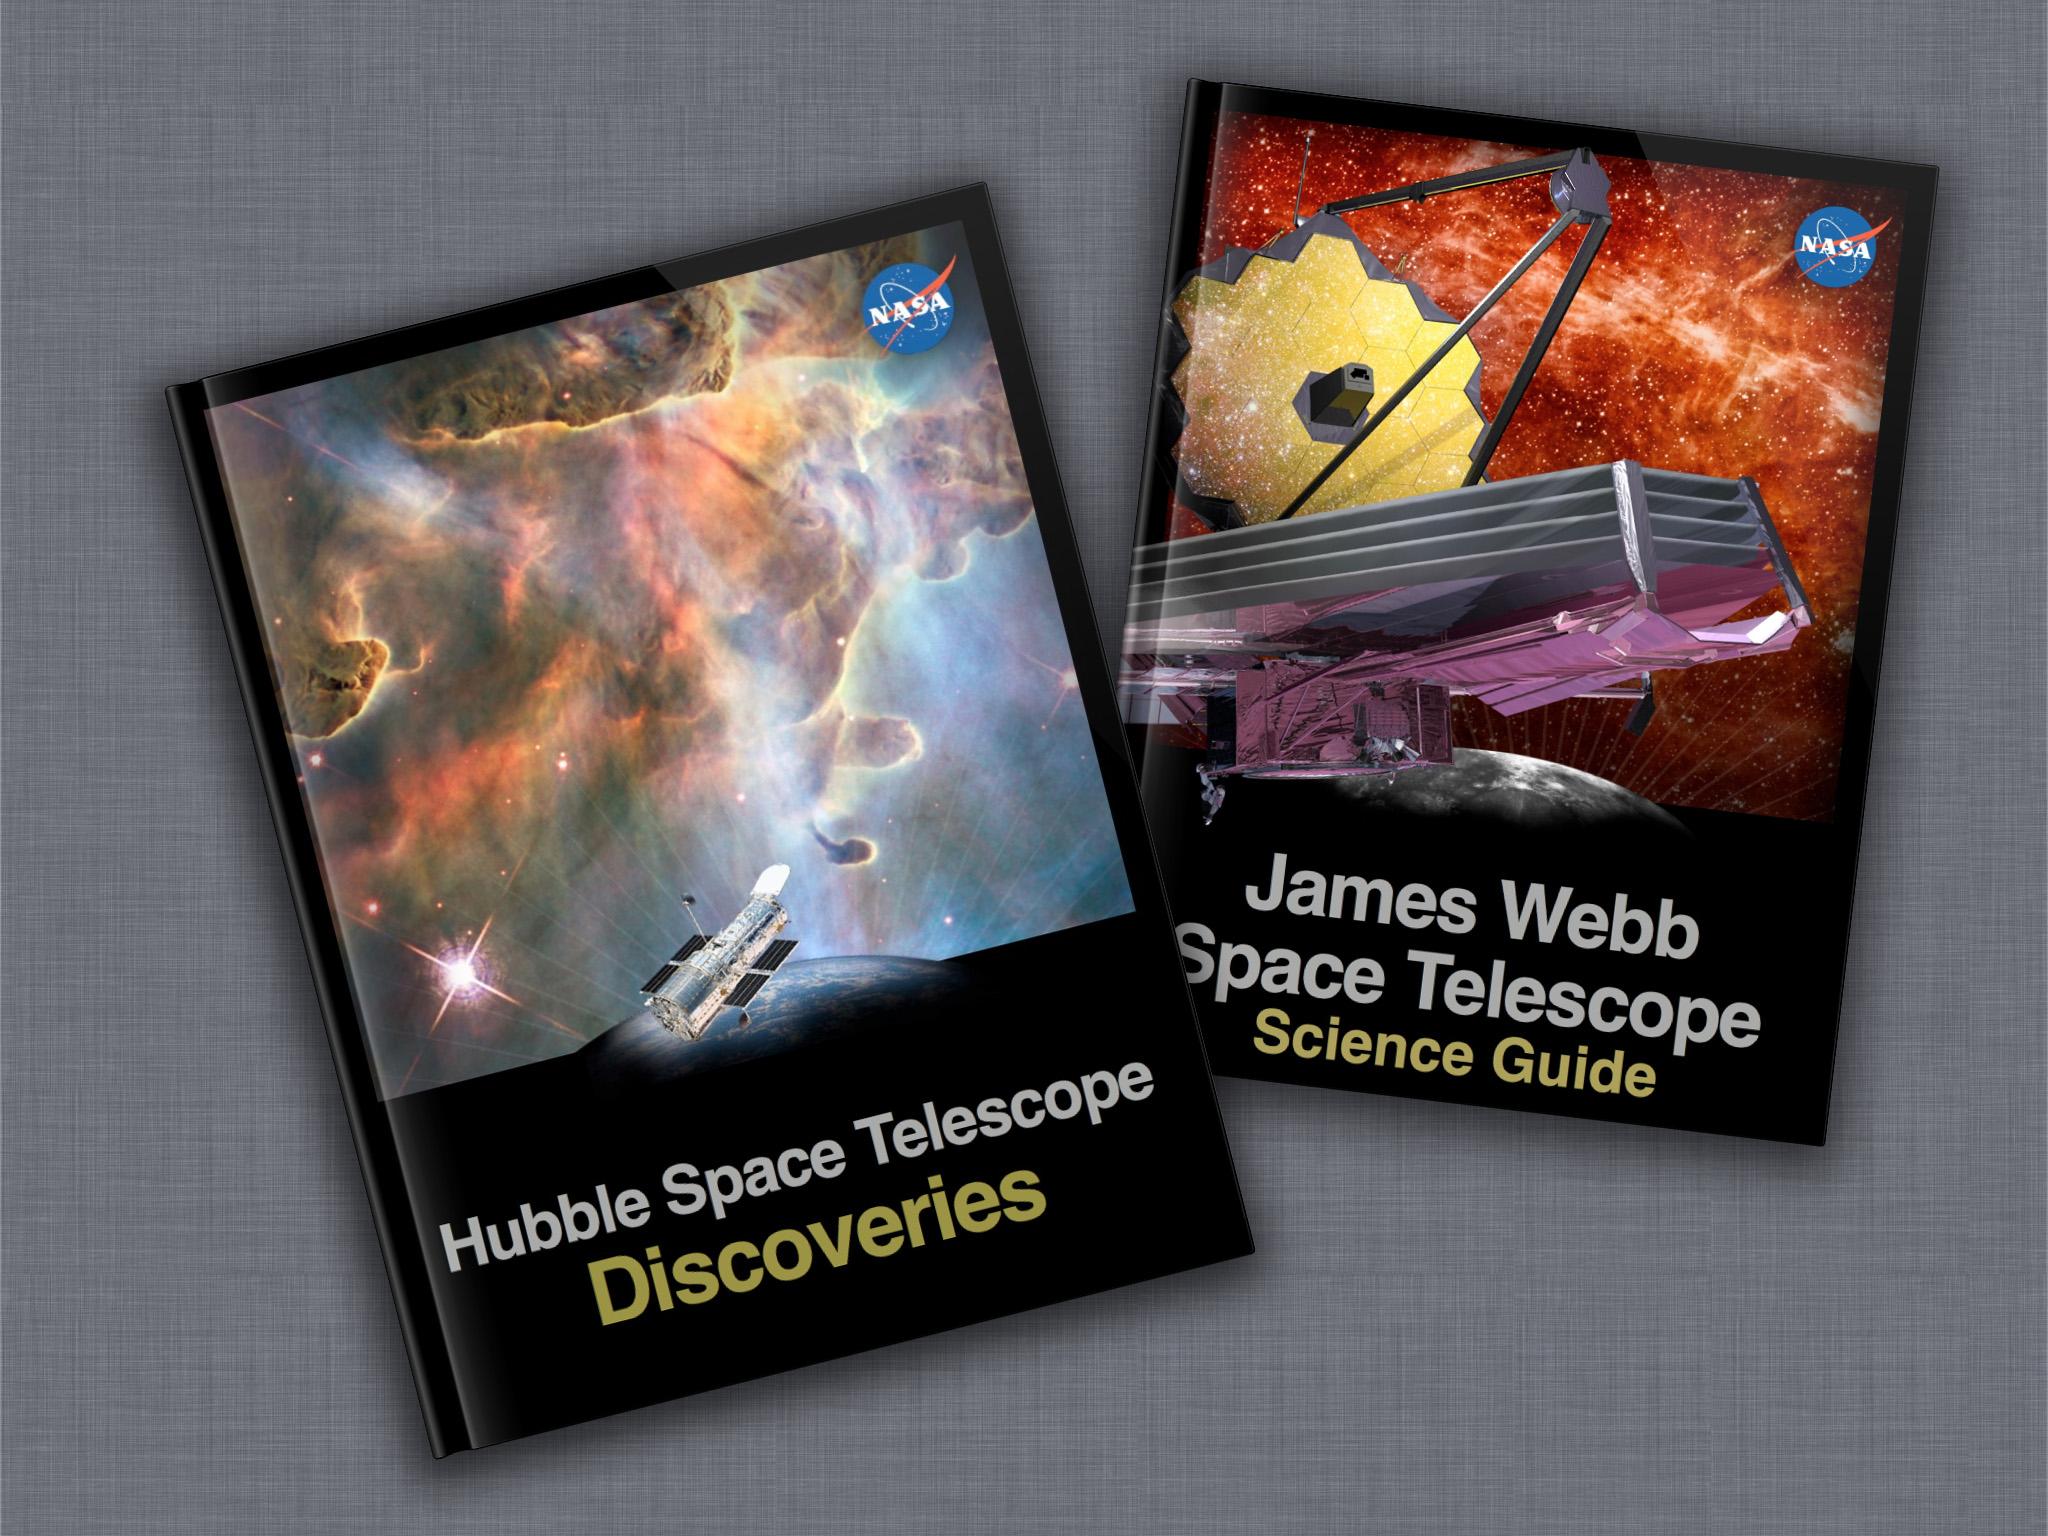 Nasa New Free E Books Available About 2 Famous Nasa